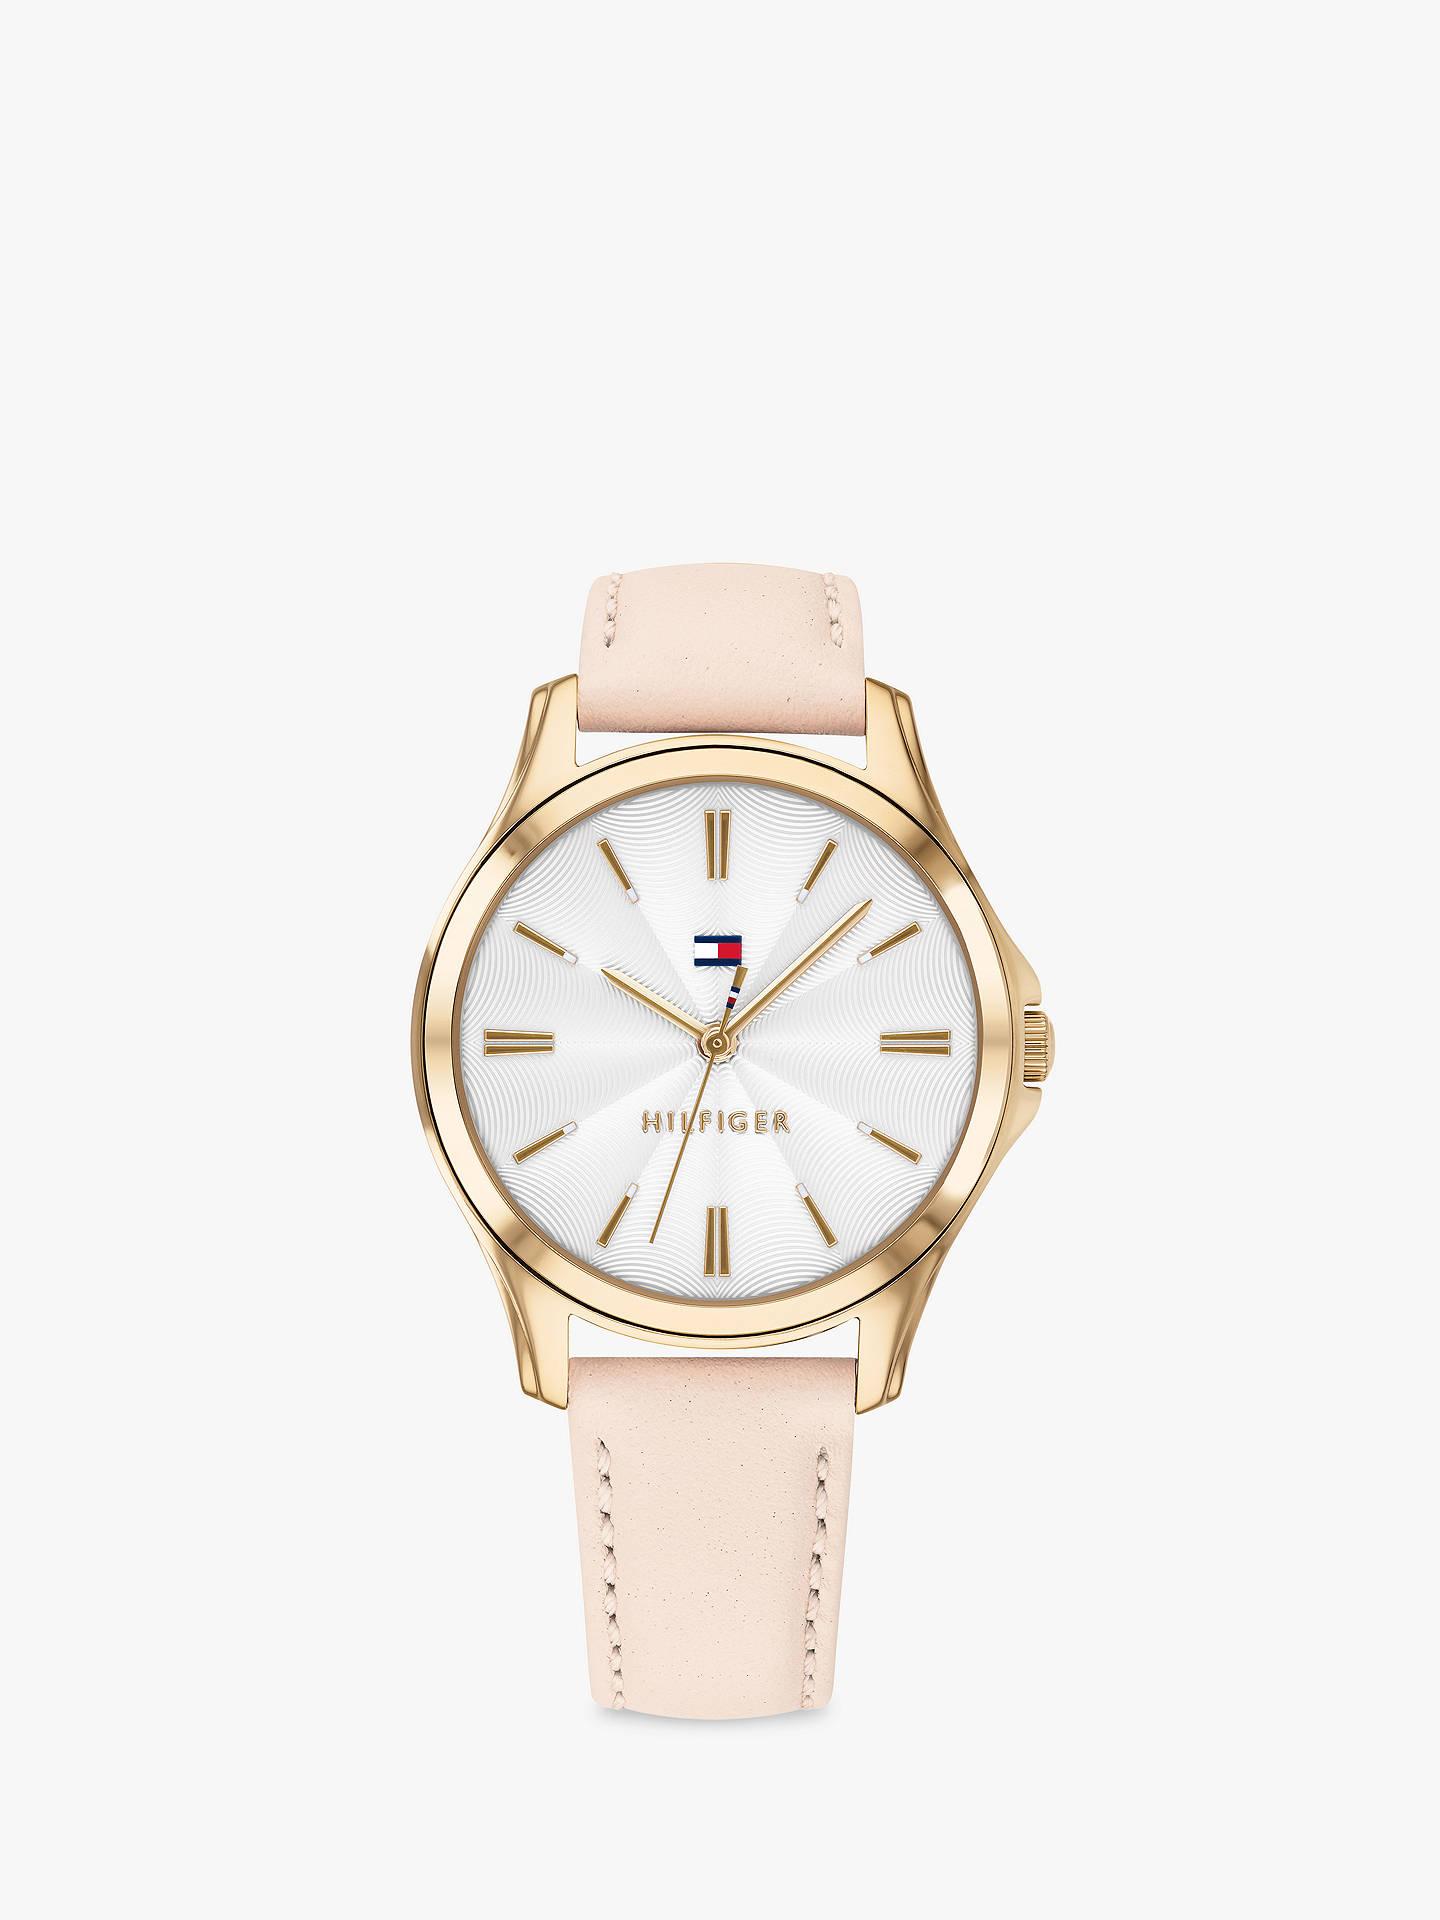 BuyTommy Hilfiger 1781954 Women s Lori Leather Strap Watch, Blush White  Online at johnlewis. 9d9267615e